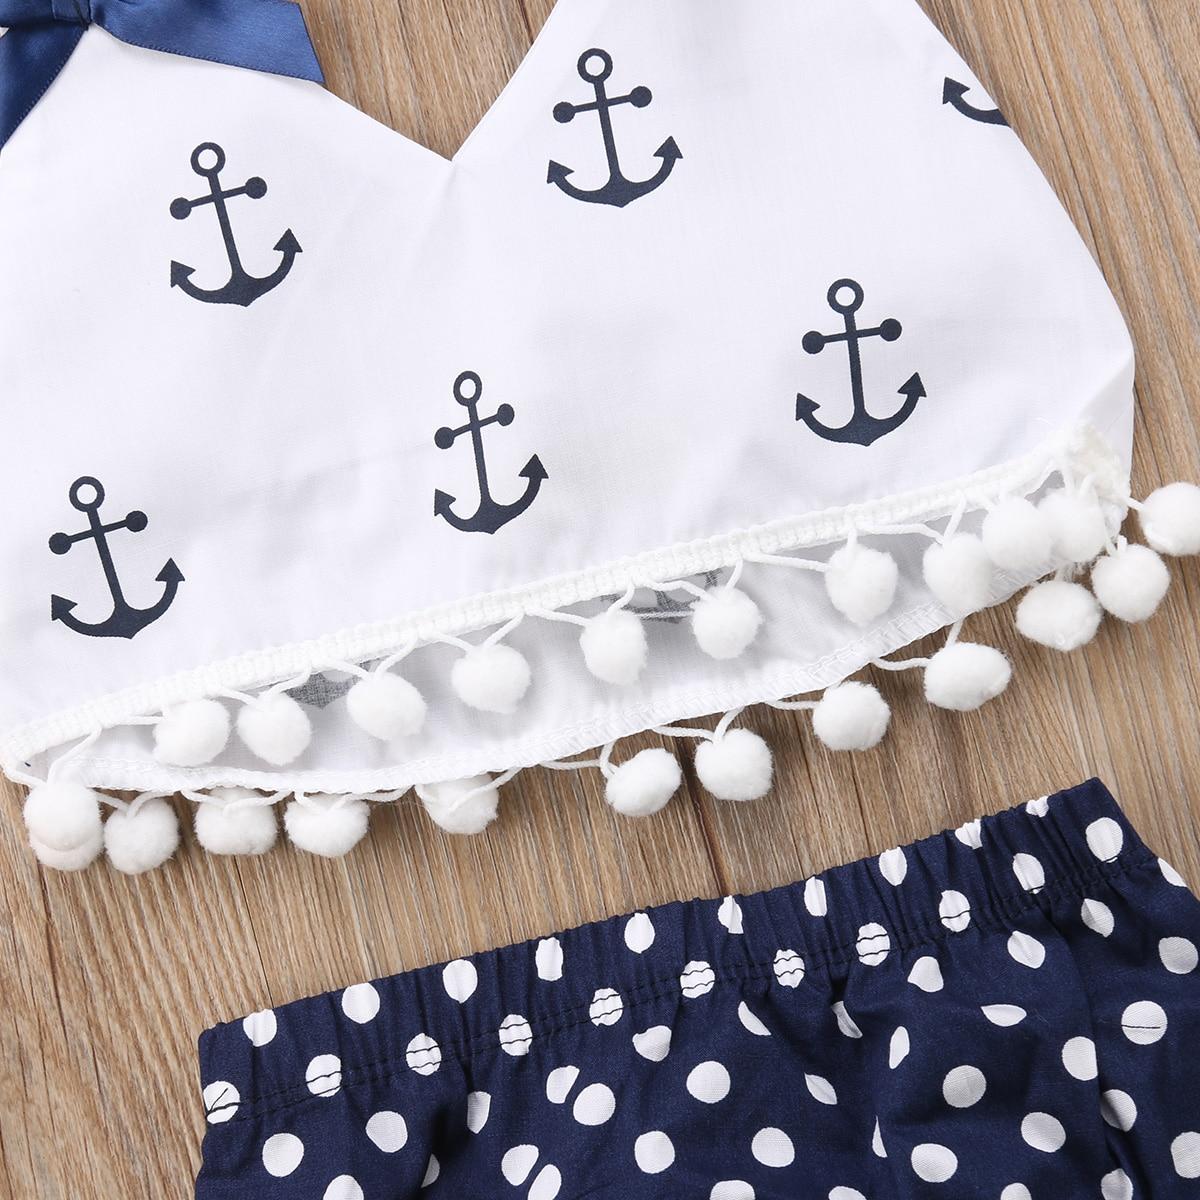 12ff71901768e Baby Girls Anchors Tops Polka Dot Briefs Tessel Bikini Swimwear Swimsuit  Outfits Bathing Suit Beachwear Hot Summer-in Swimwear from Mother   Kids on  ...